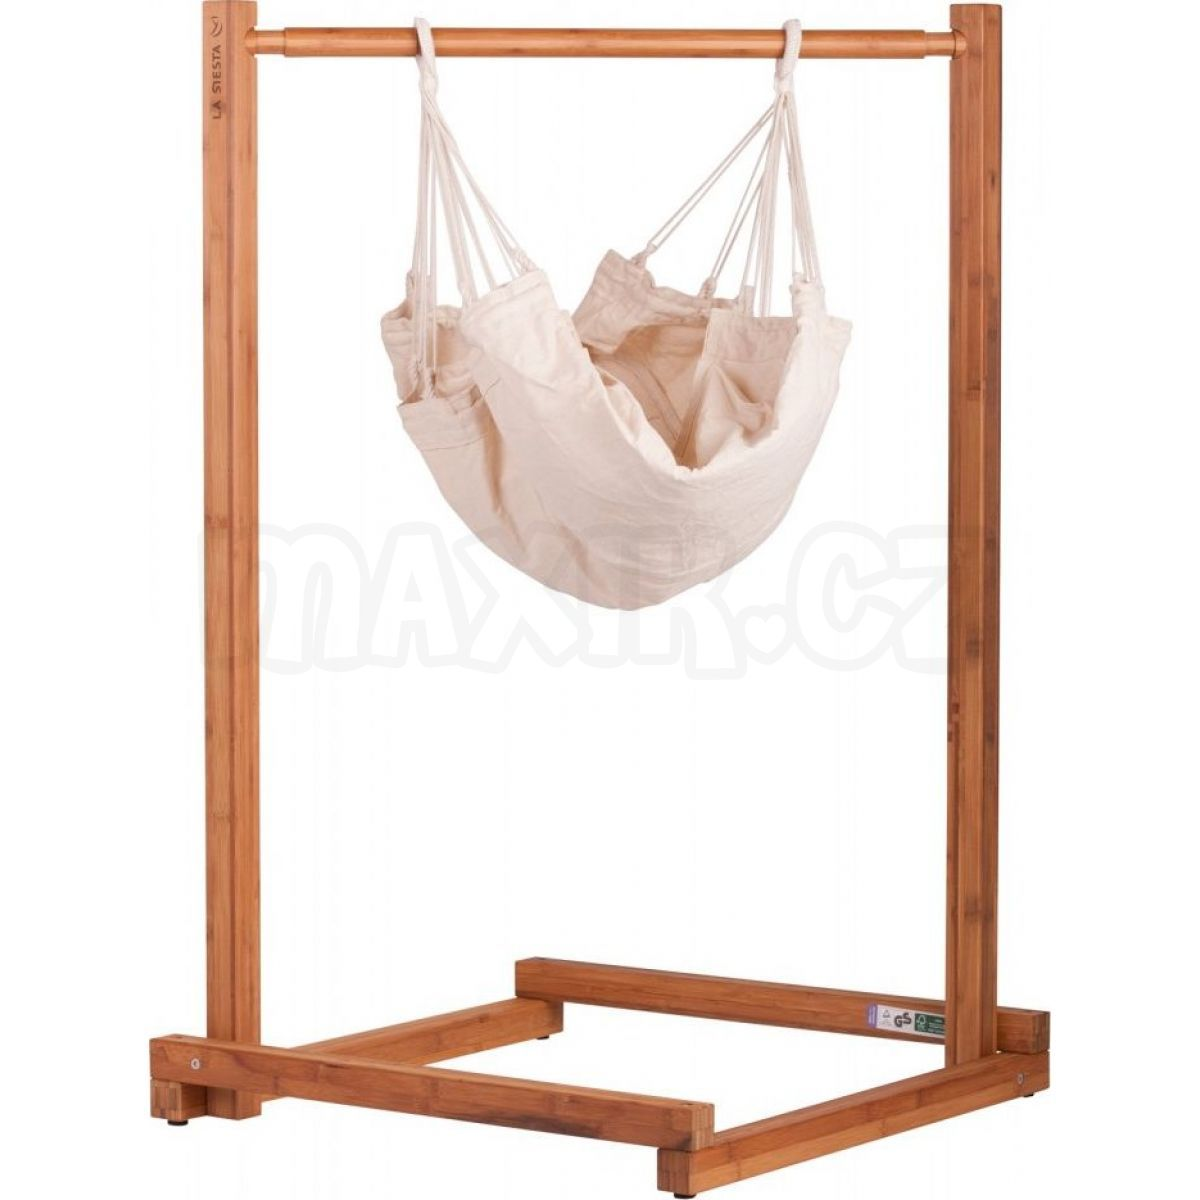 la siesta kojeneck houpac s se stojanem yayita max kovy hra ky. Black Bedroom Furniture Sets. Home Design Ideas